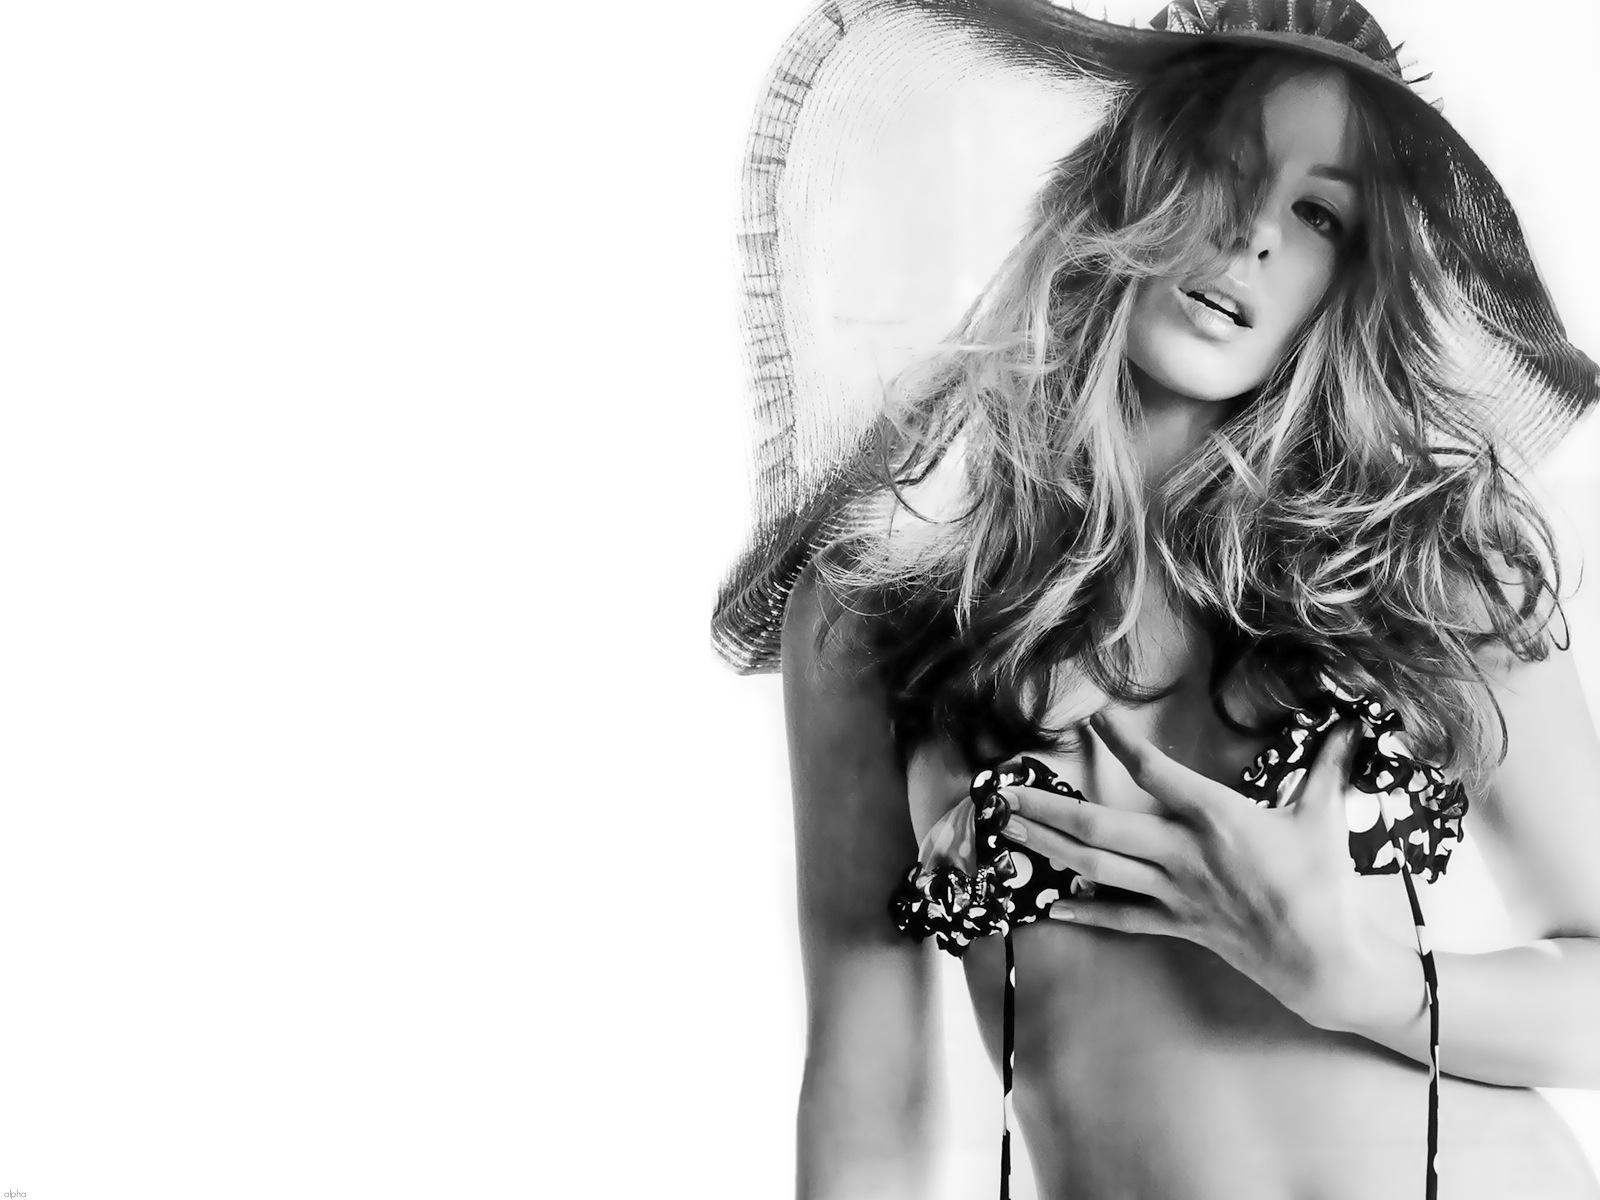 http://4.bp.blogspot.com/-75vKMdPCM3k/Txb-7ZMulNI/AAAAAAAAAlQ/VhF9RkyVPEw/s1600/Kate-Beckinsale-Black-White-hot-2012-01.jpg